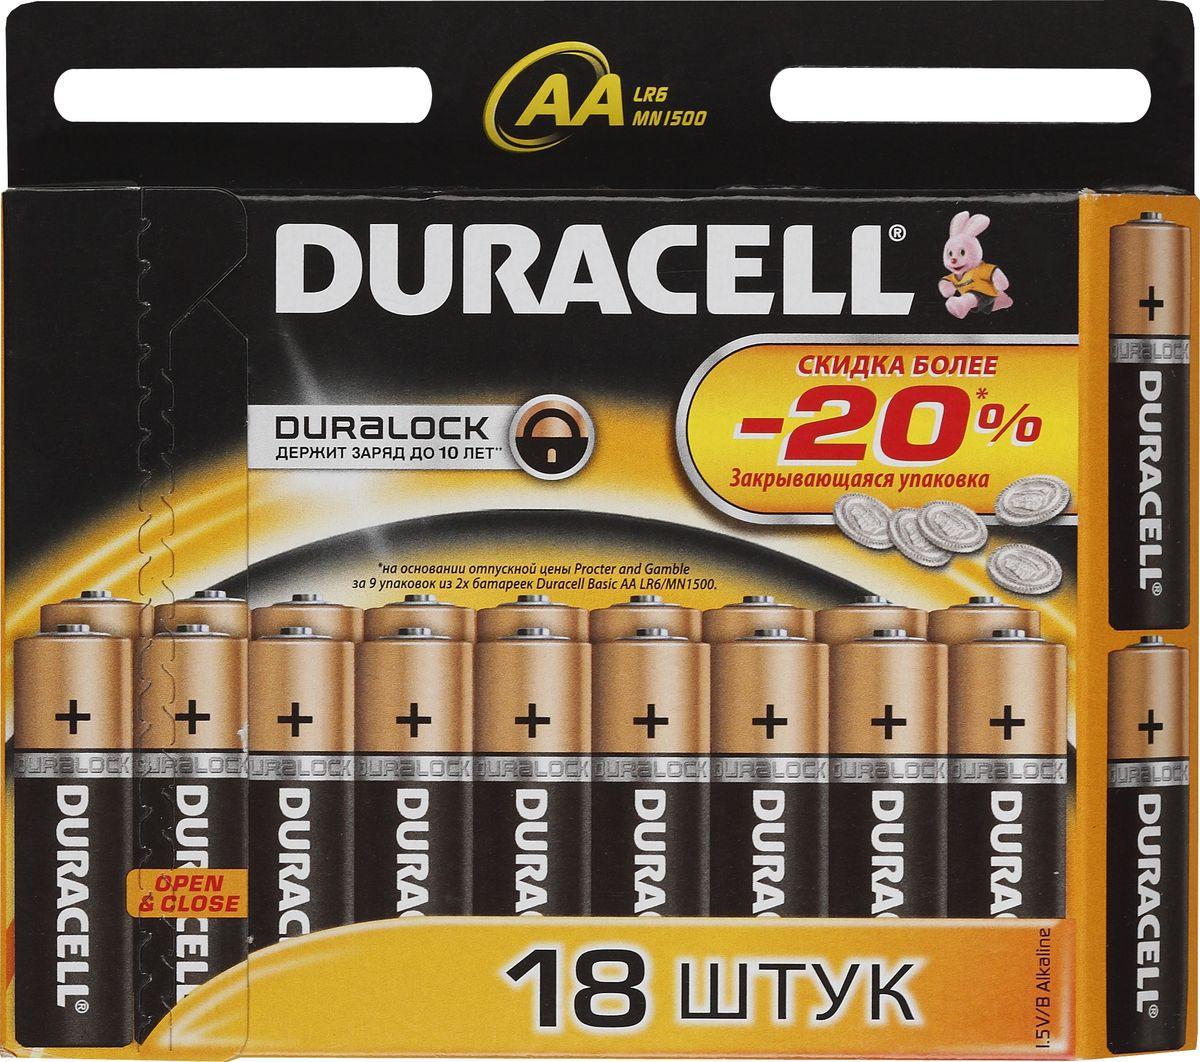 Набор алкалиновых батареек Duracell  Basic , LR6-18BL, 18 шт - Батарейки и аккумуляторы